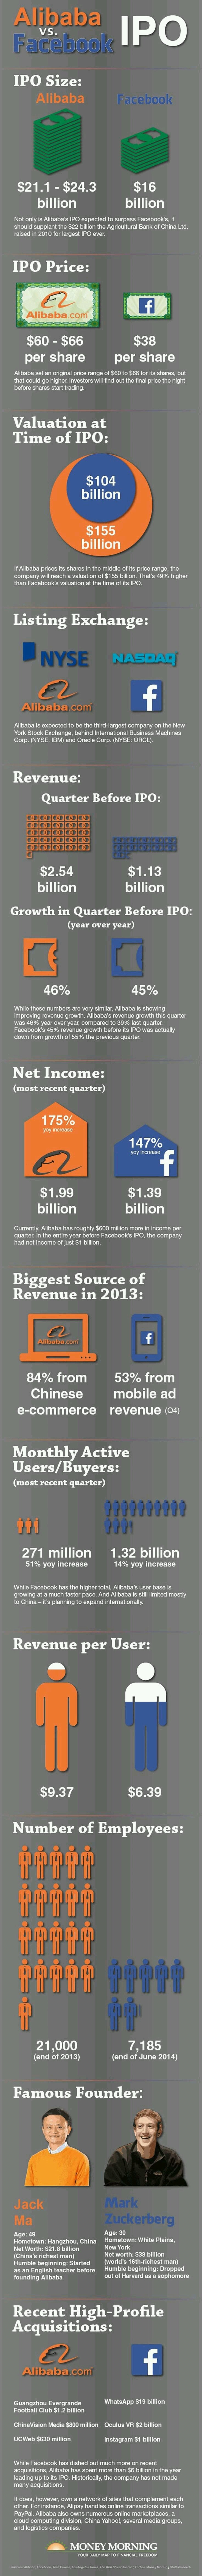 Alibaba vs. Facebook IPO #infographic